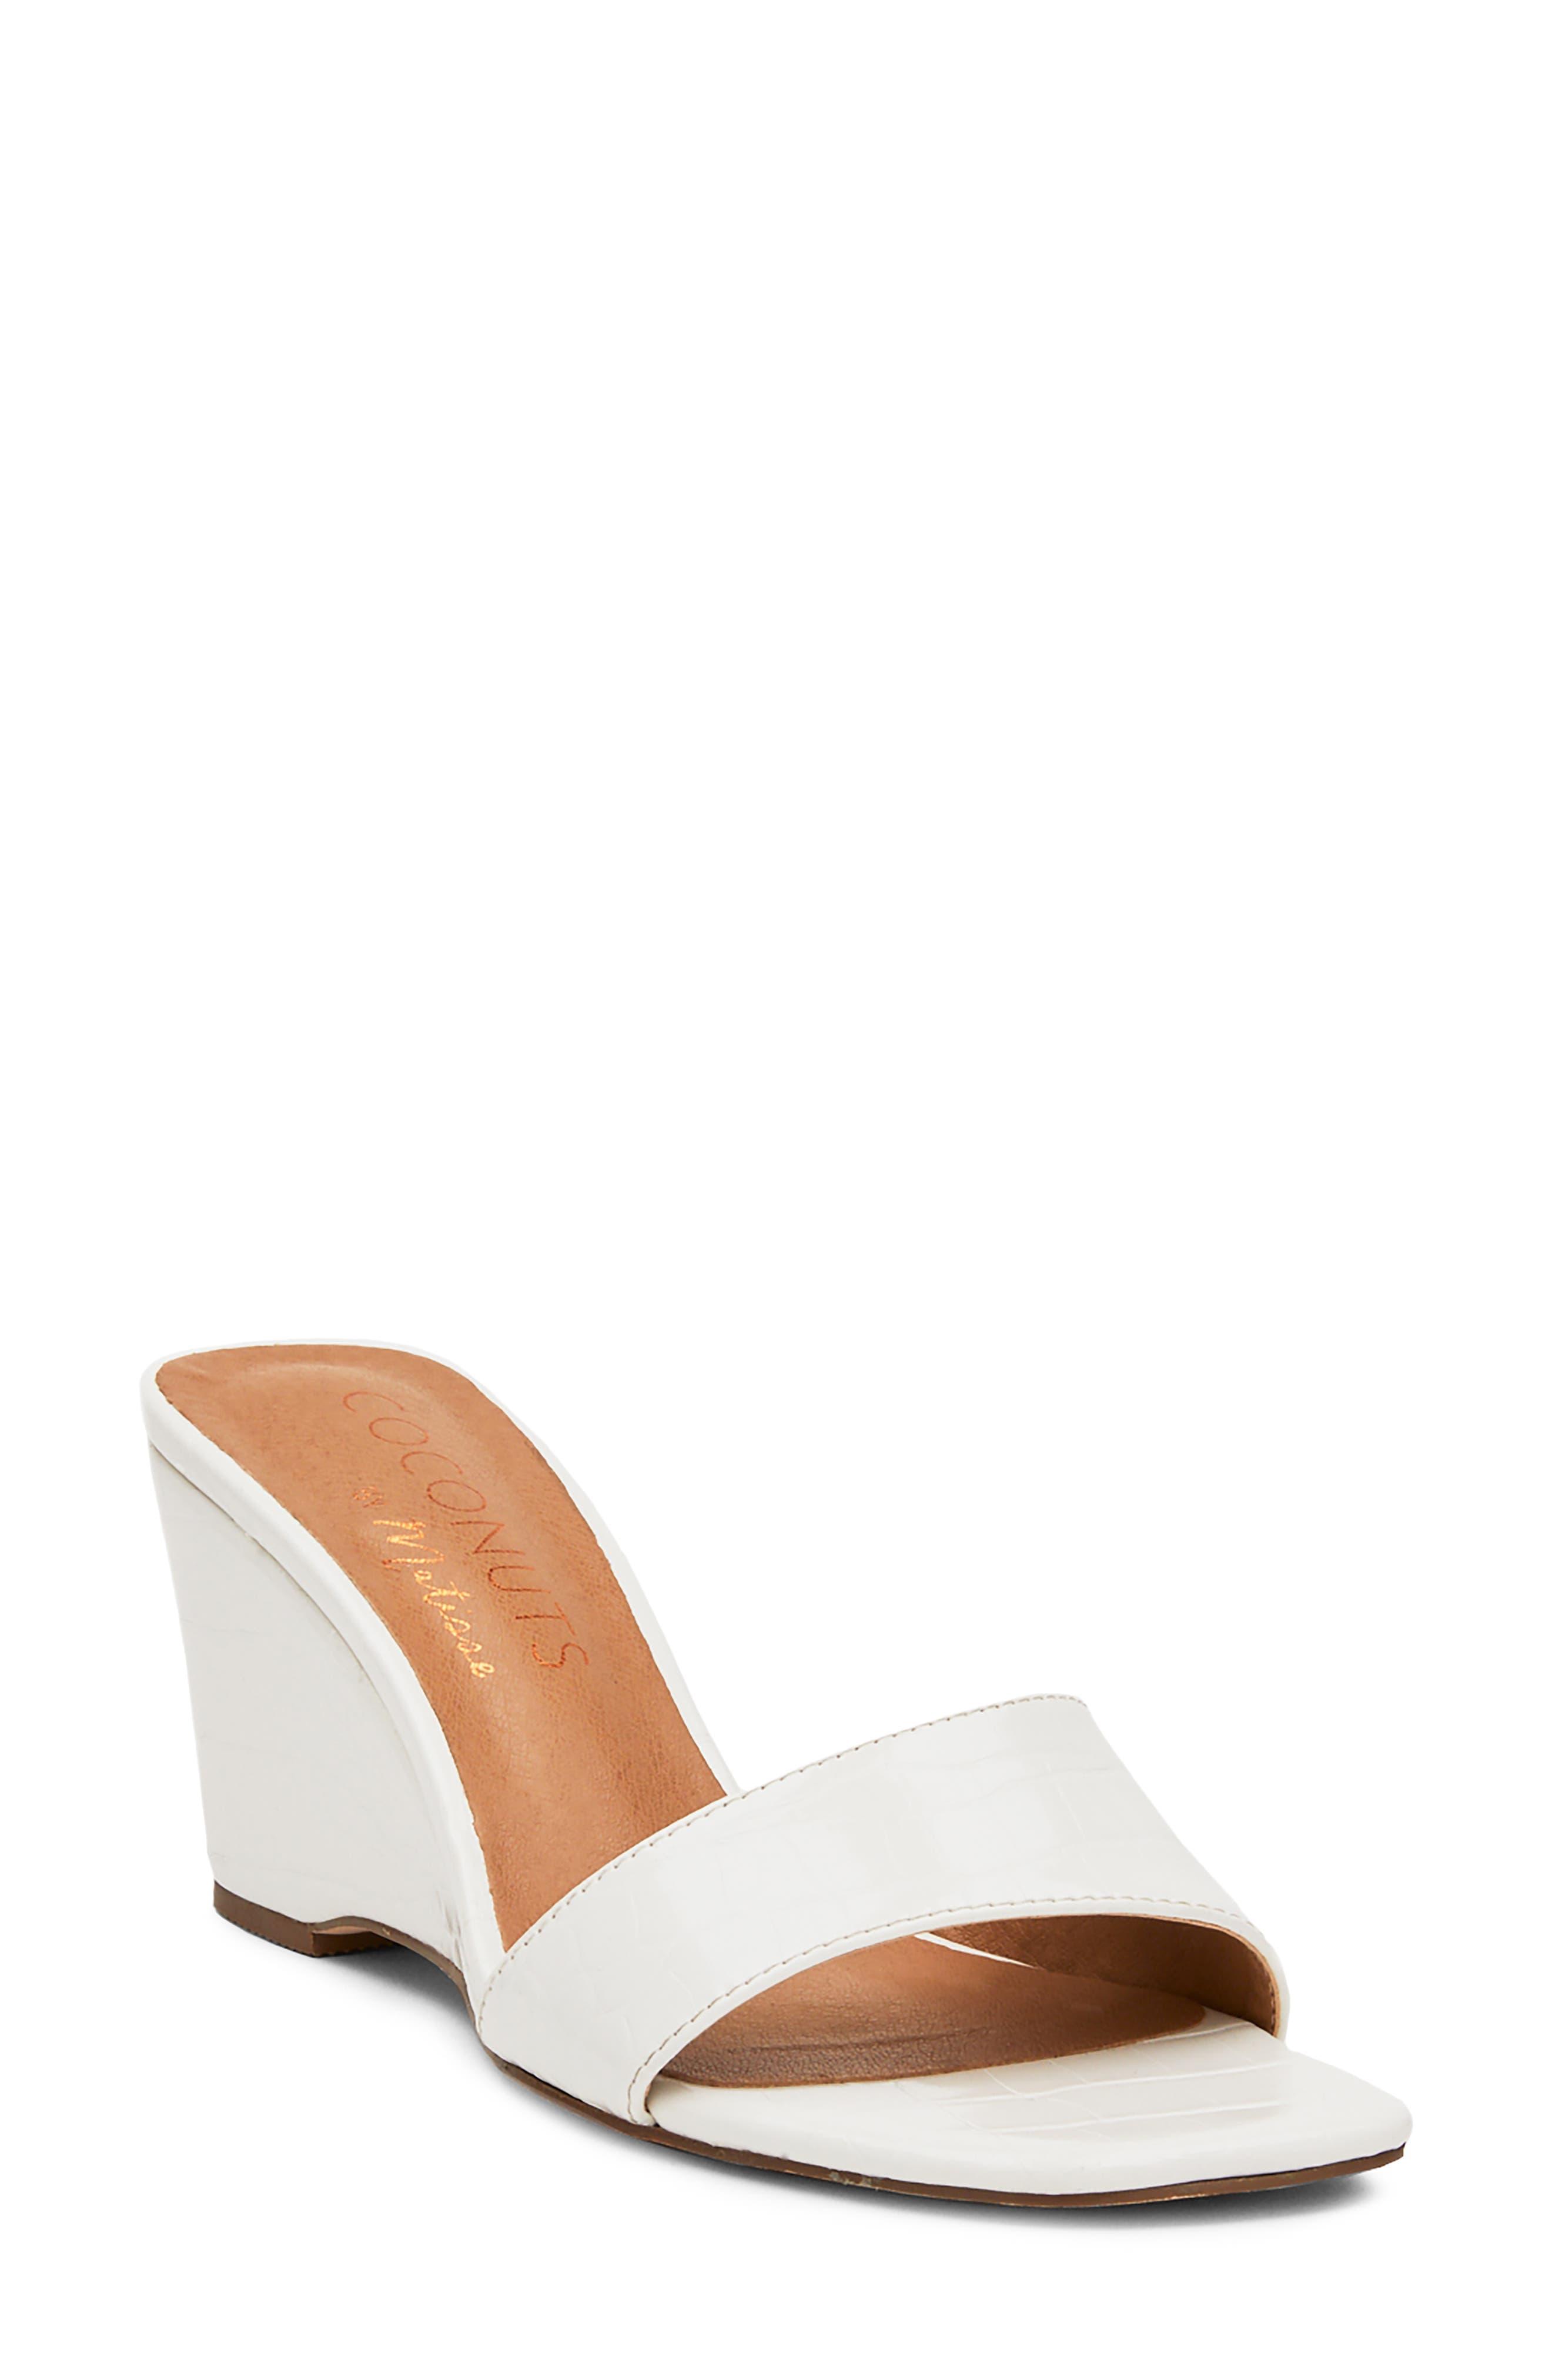 In Bloom Slide Sandal